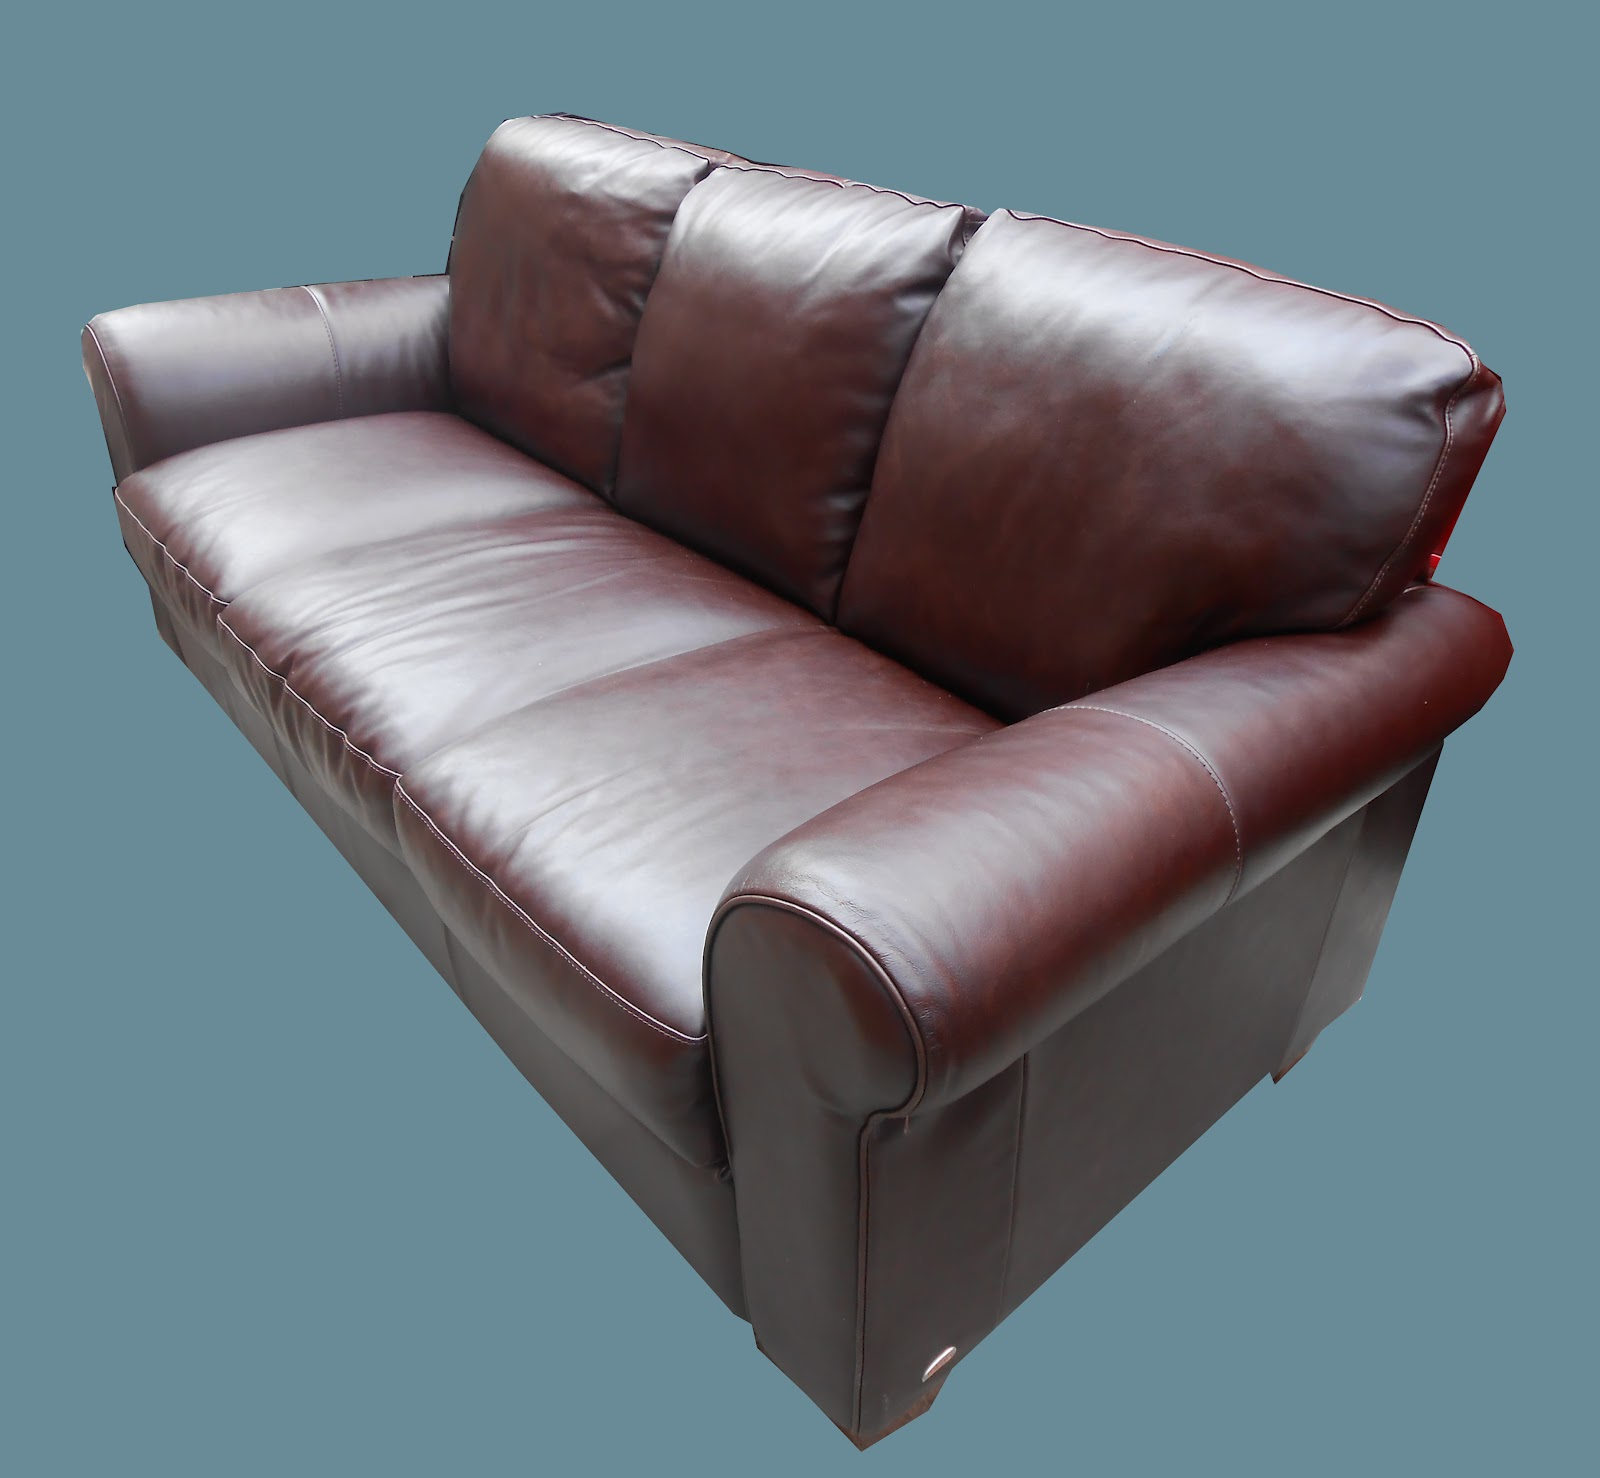 Italsofa Leather Sofa: Uhuru Furniture & Collectibles: Italsofa Leather Sofa- SOLD